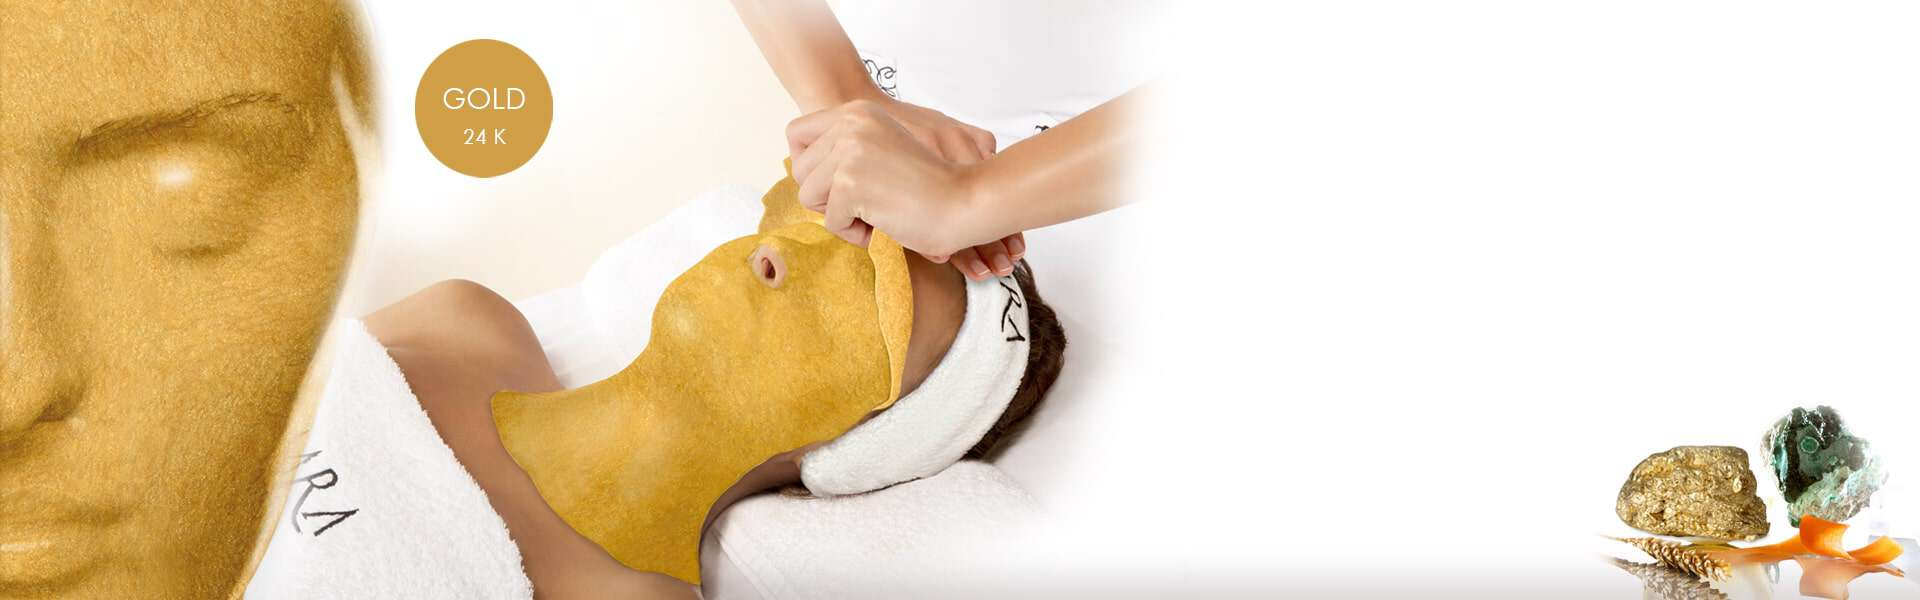 Guld Mask Behandling